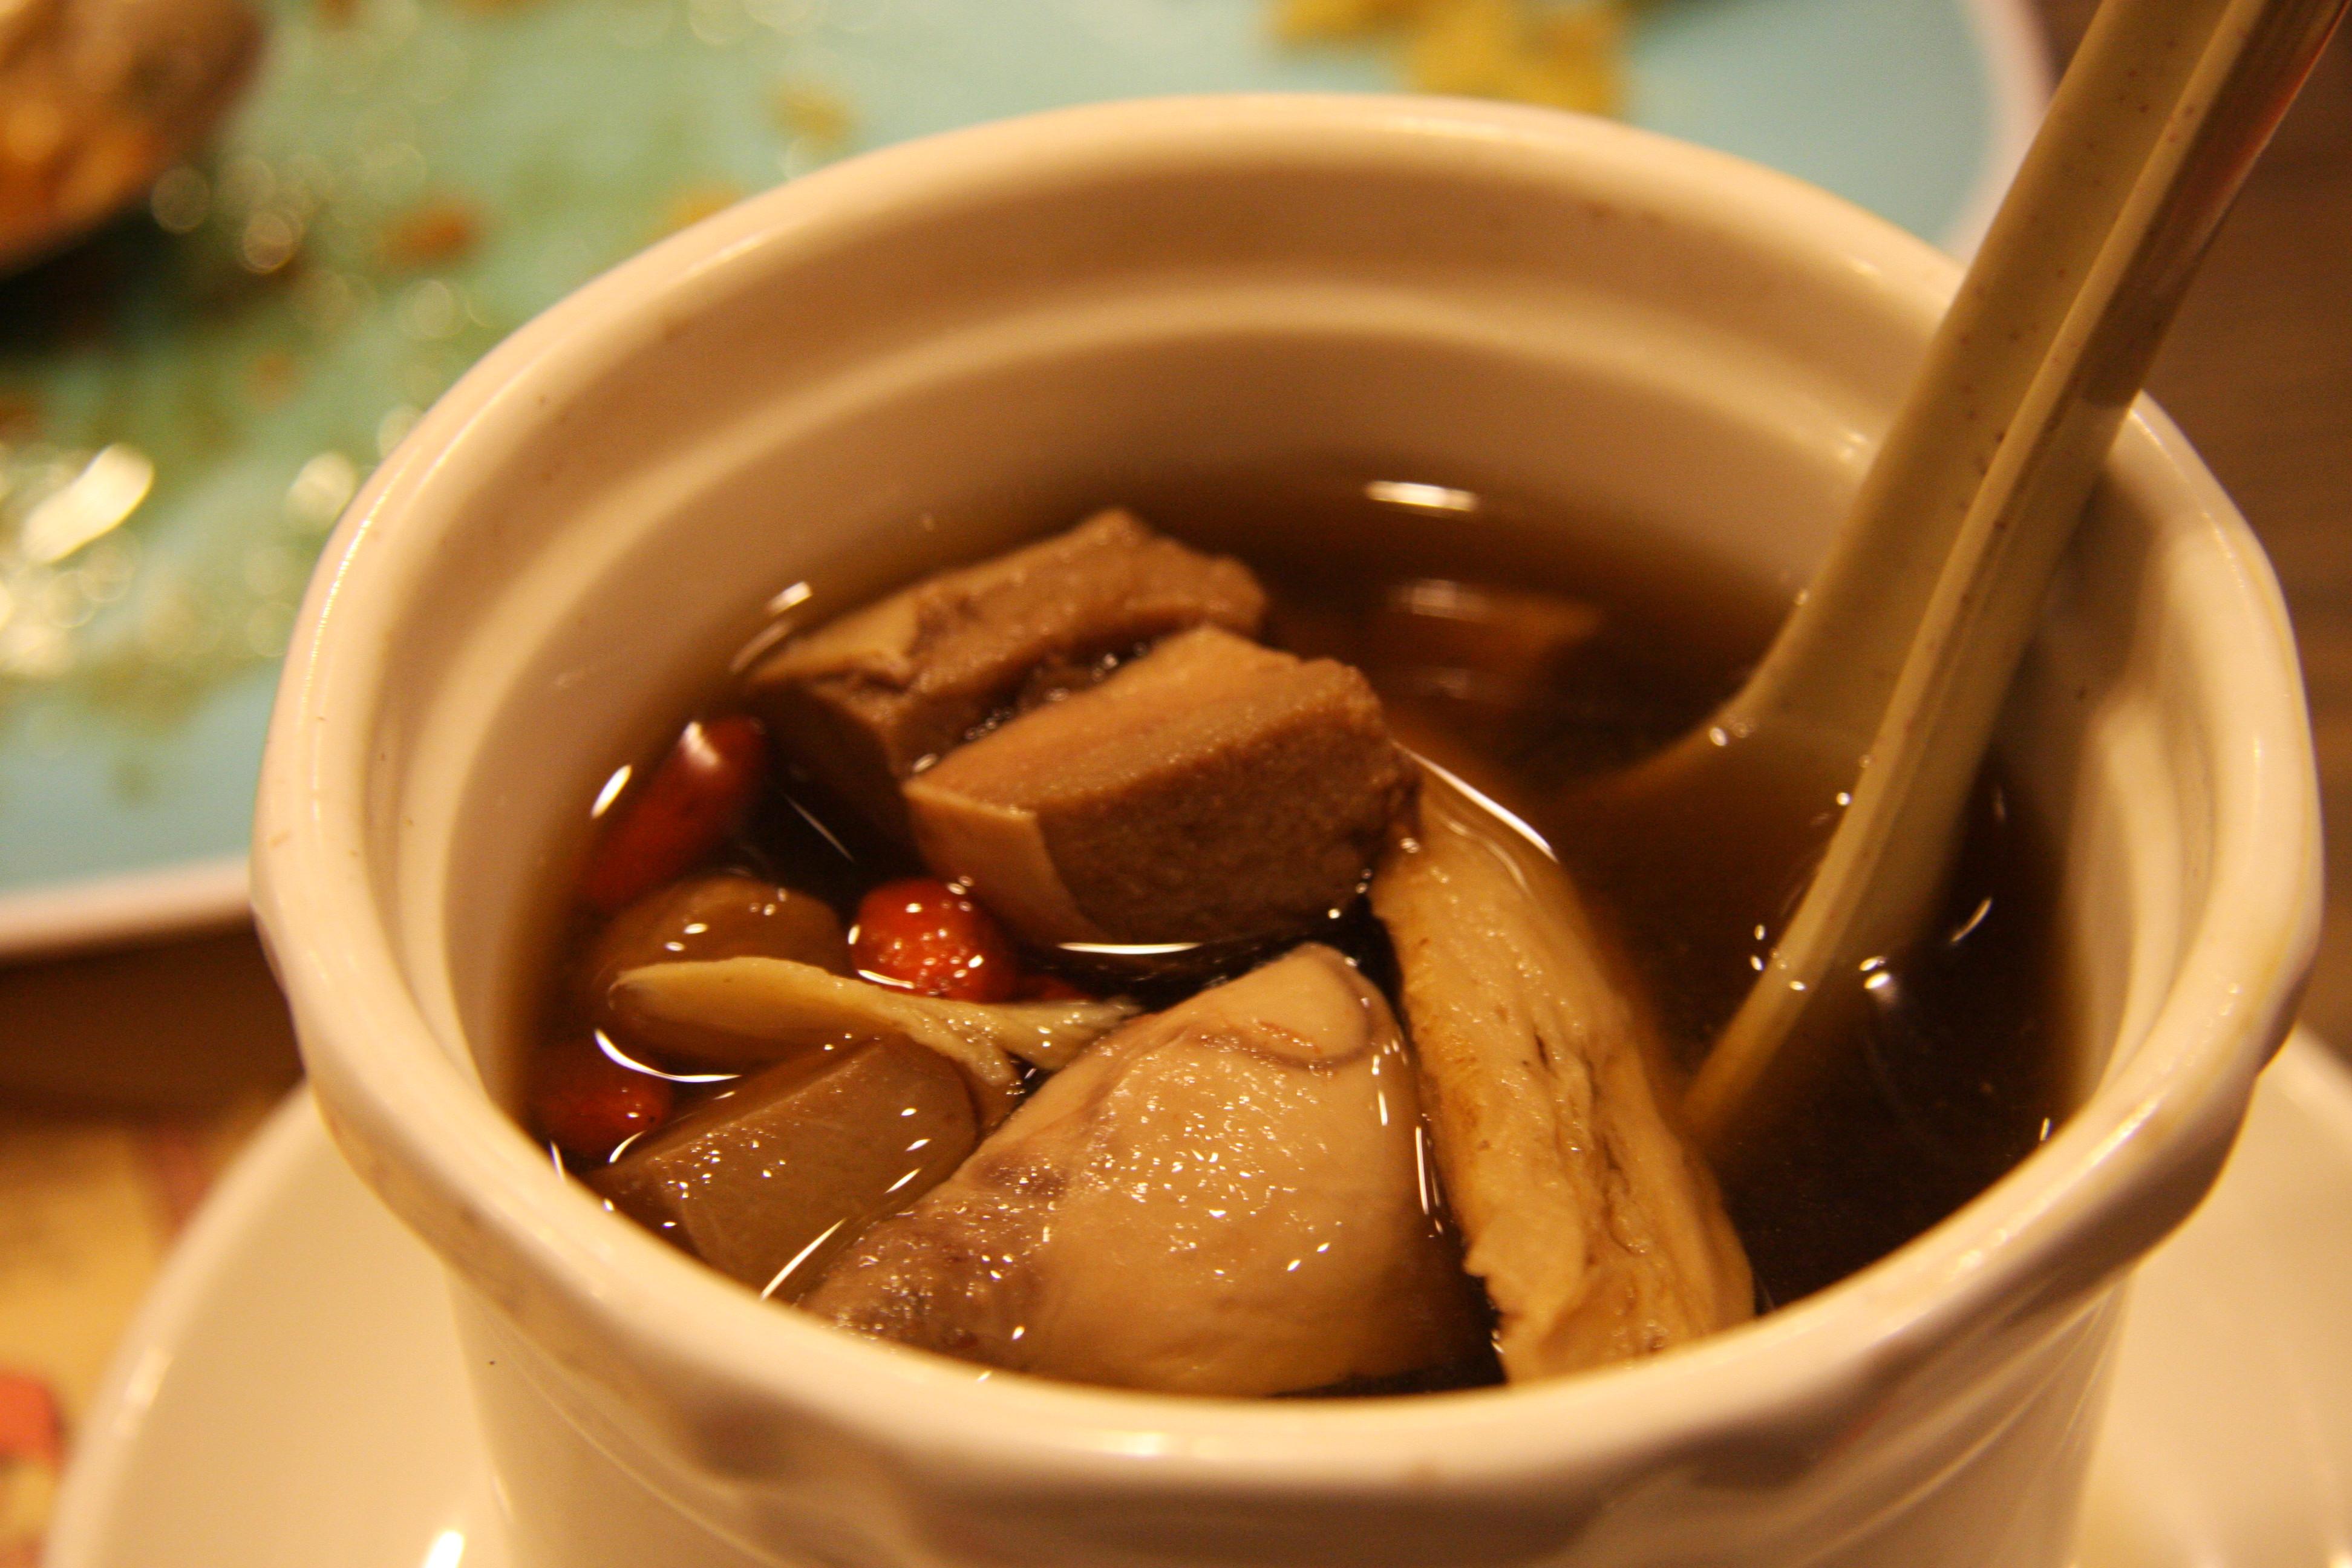 Goat testicle soup